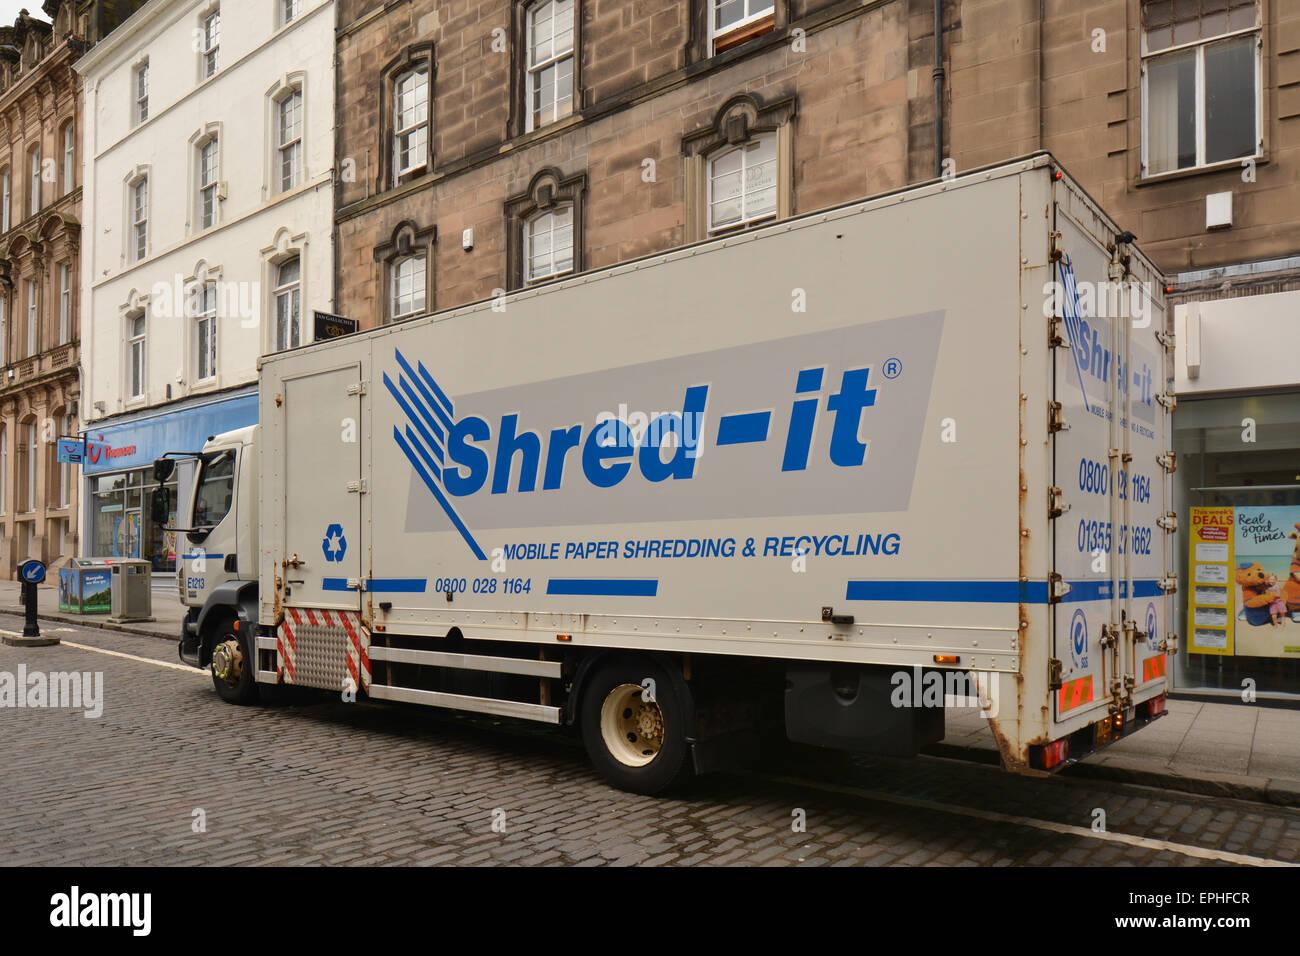 Shred-it - mobile document destruction service - Stirling, Scotland, uk - Stock Image